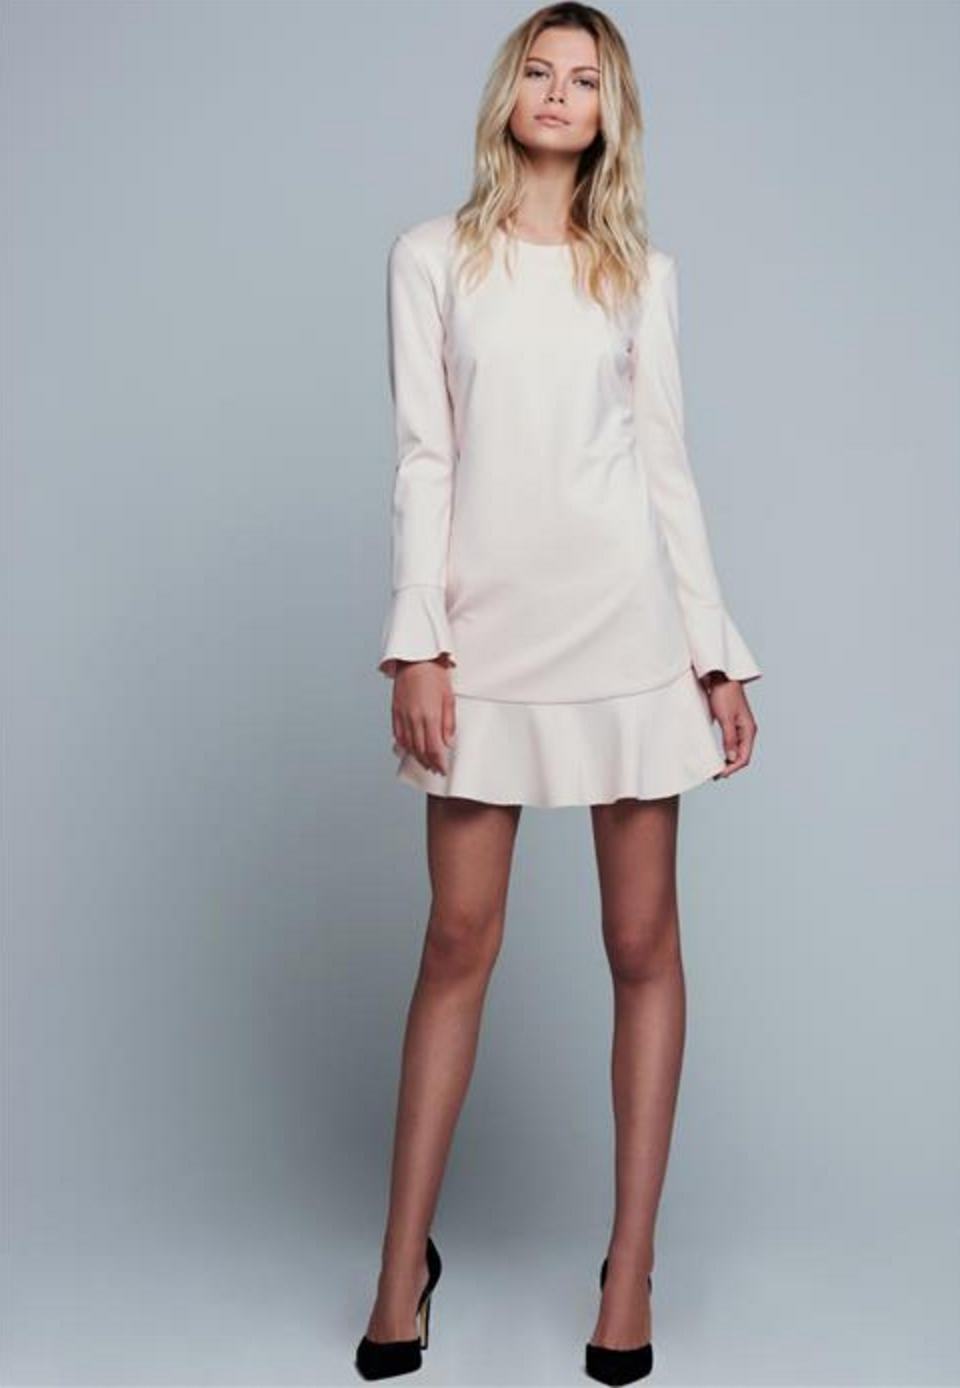 Bardot bella dress $99.99